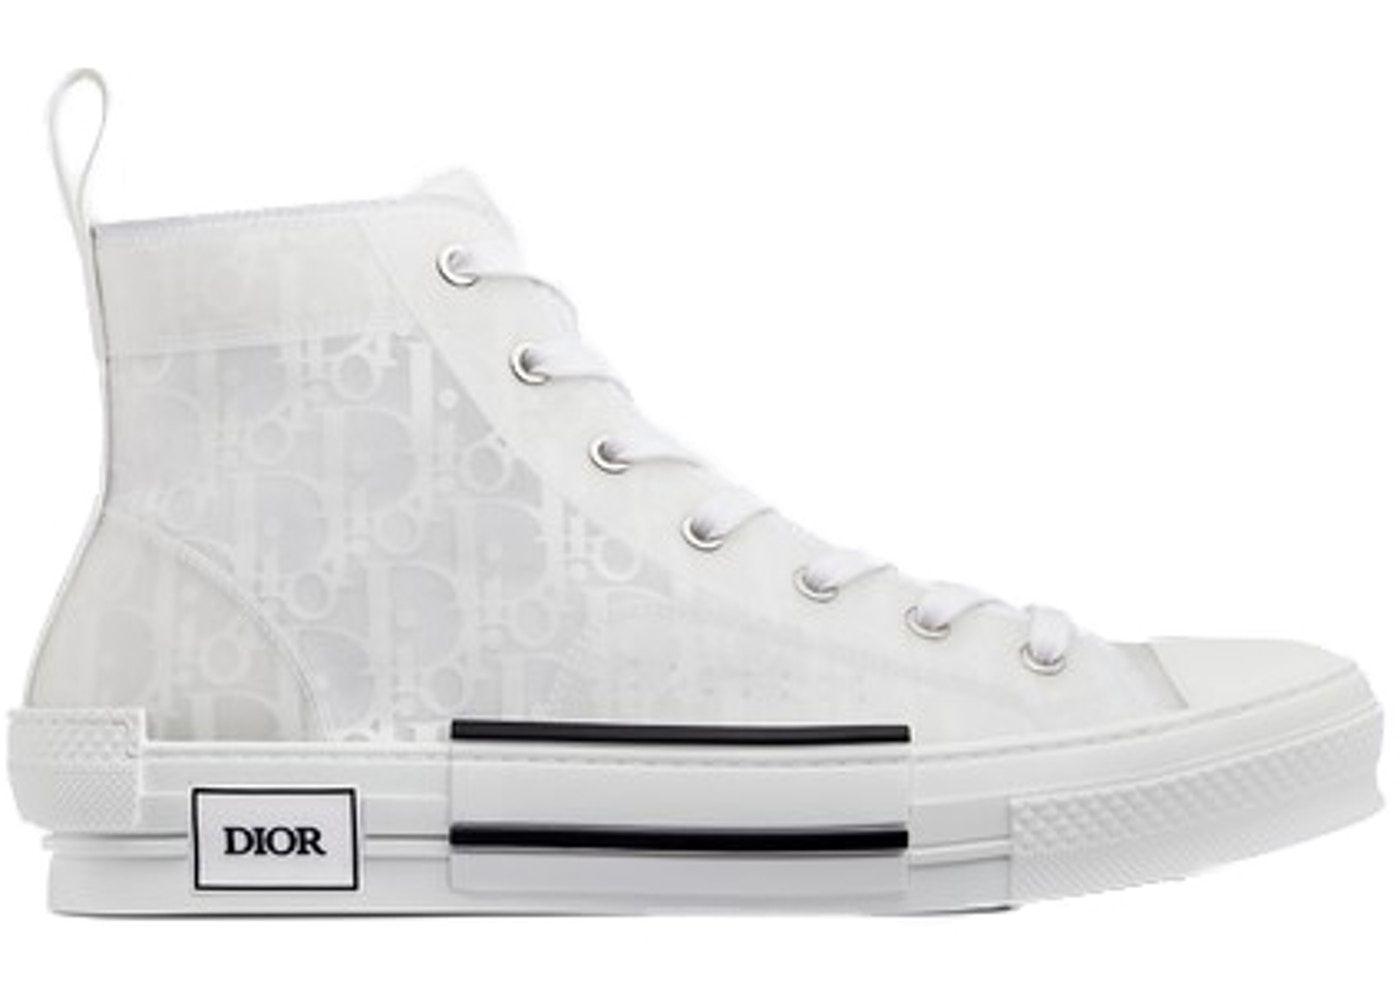 dior high tops converse